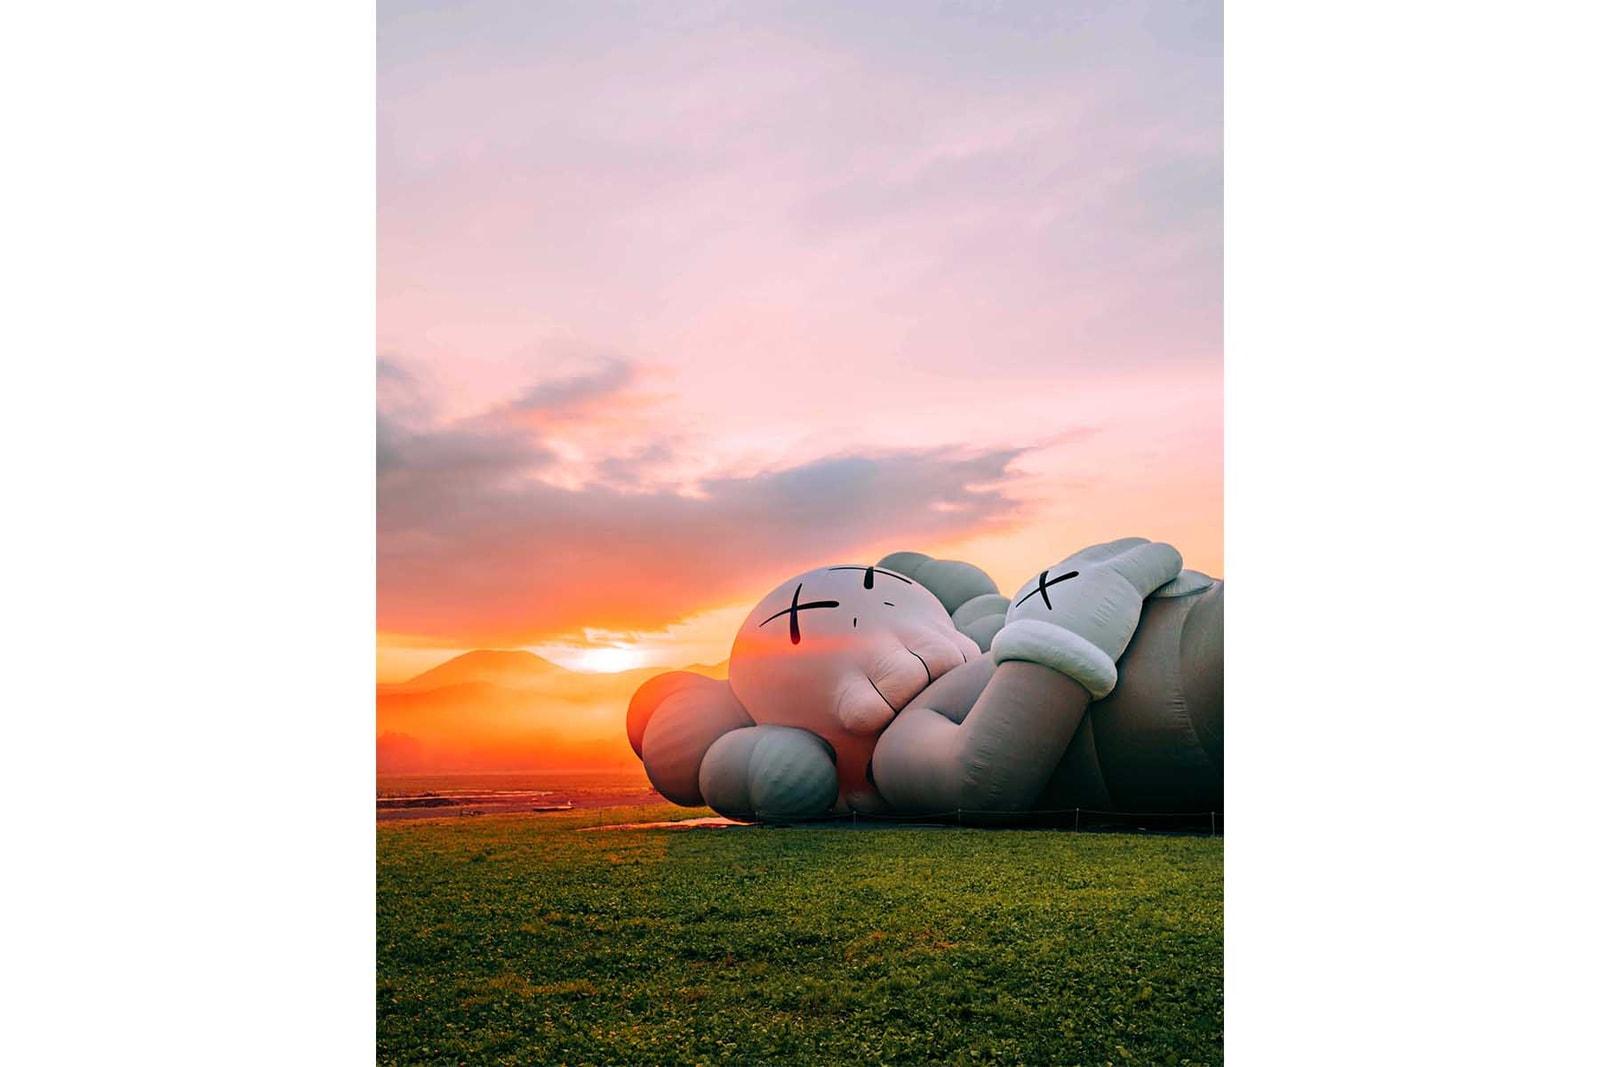 KAWS カウズ 富士山 限定 アイテム ふもとっぱらキャンプ場 住所 入場料 抽選 応募 ぬいぐるみ コンパニオン フィギュア セラミックプレート ファイヤーキングマグ ピン クッション Tシャツ トートバッグ